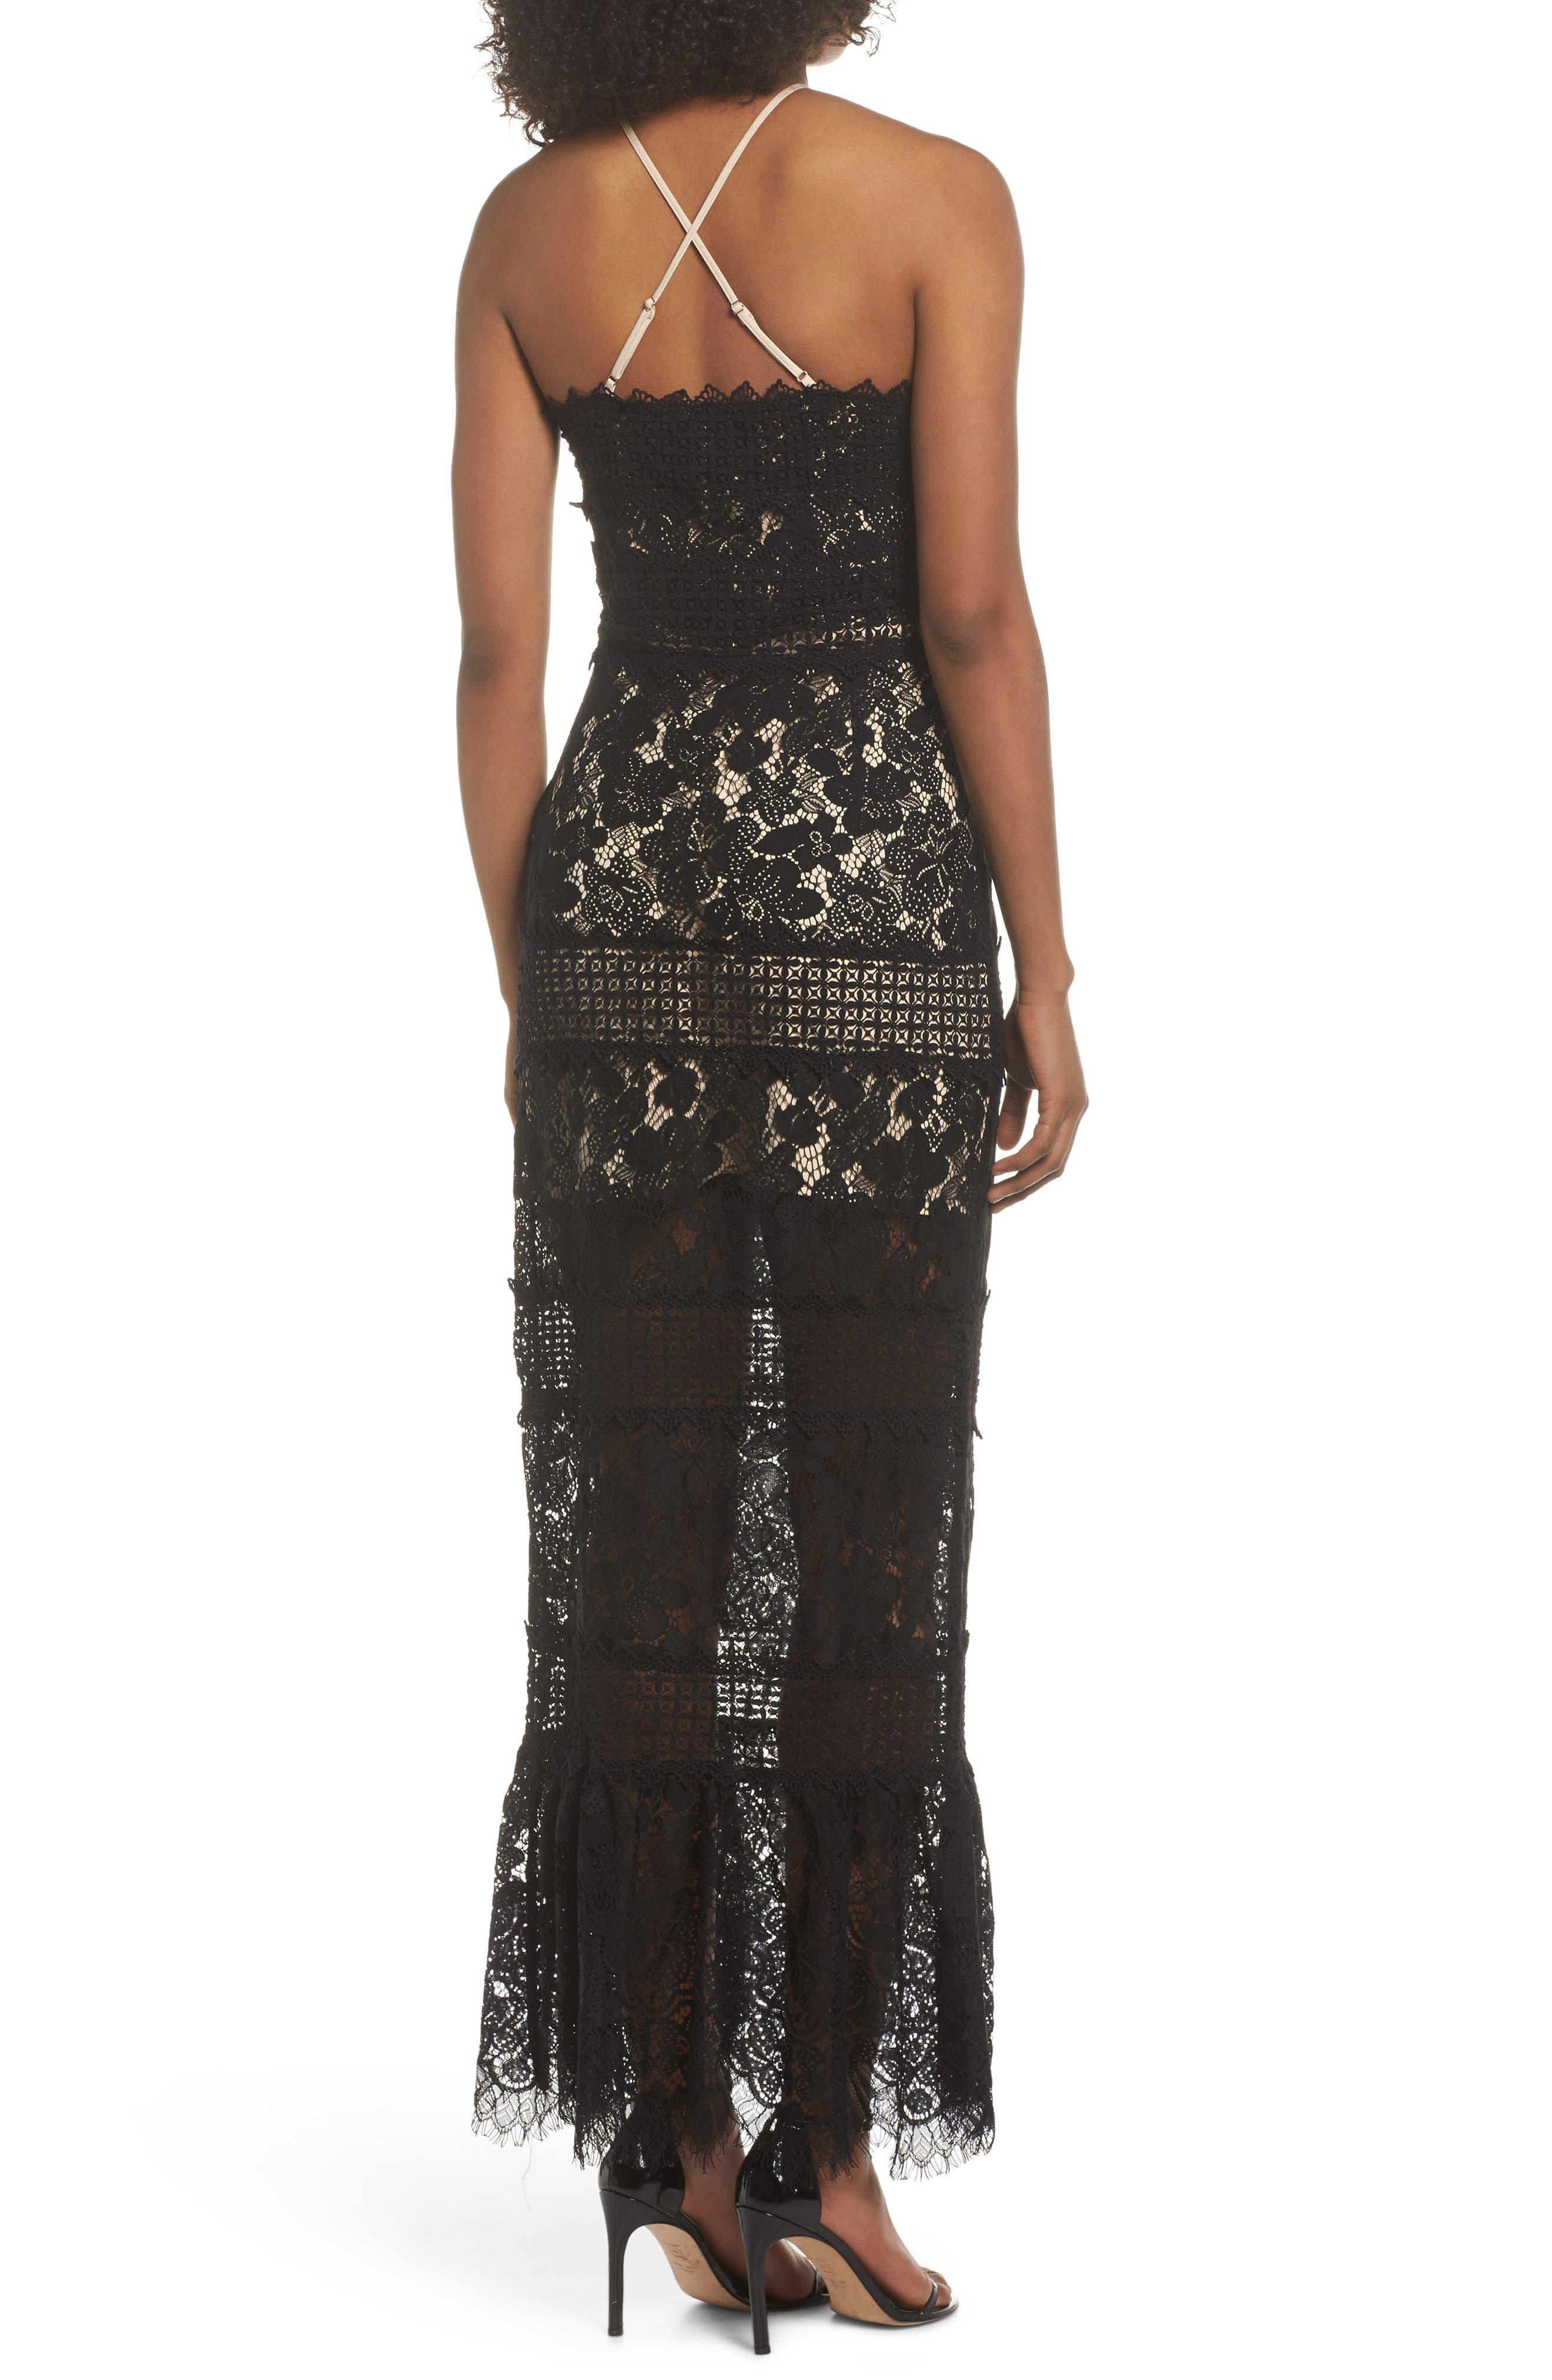 Tabitha Lace Maxi Dress,                             Alternate thumbnail 2, color,                             001